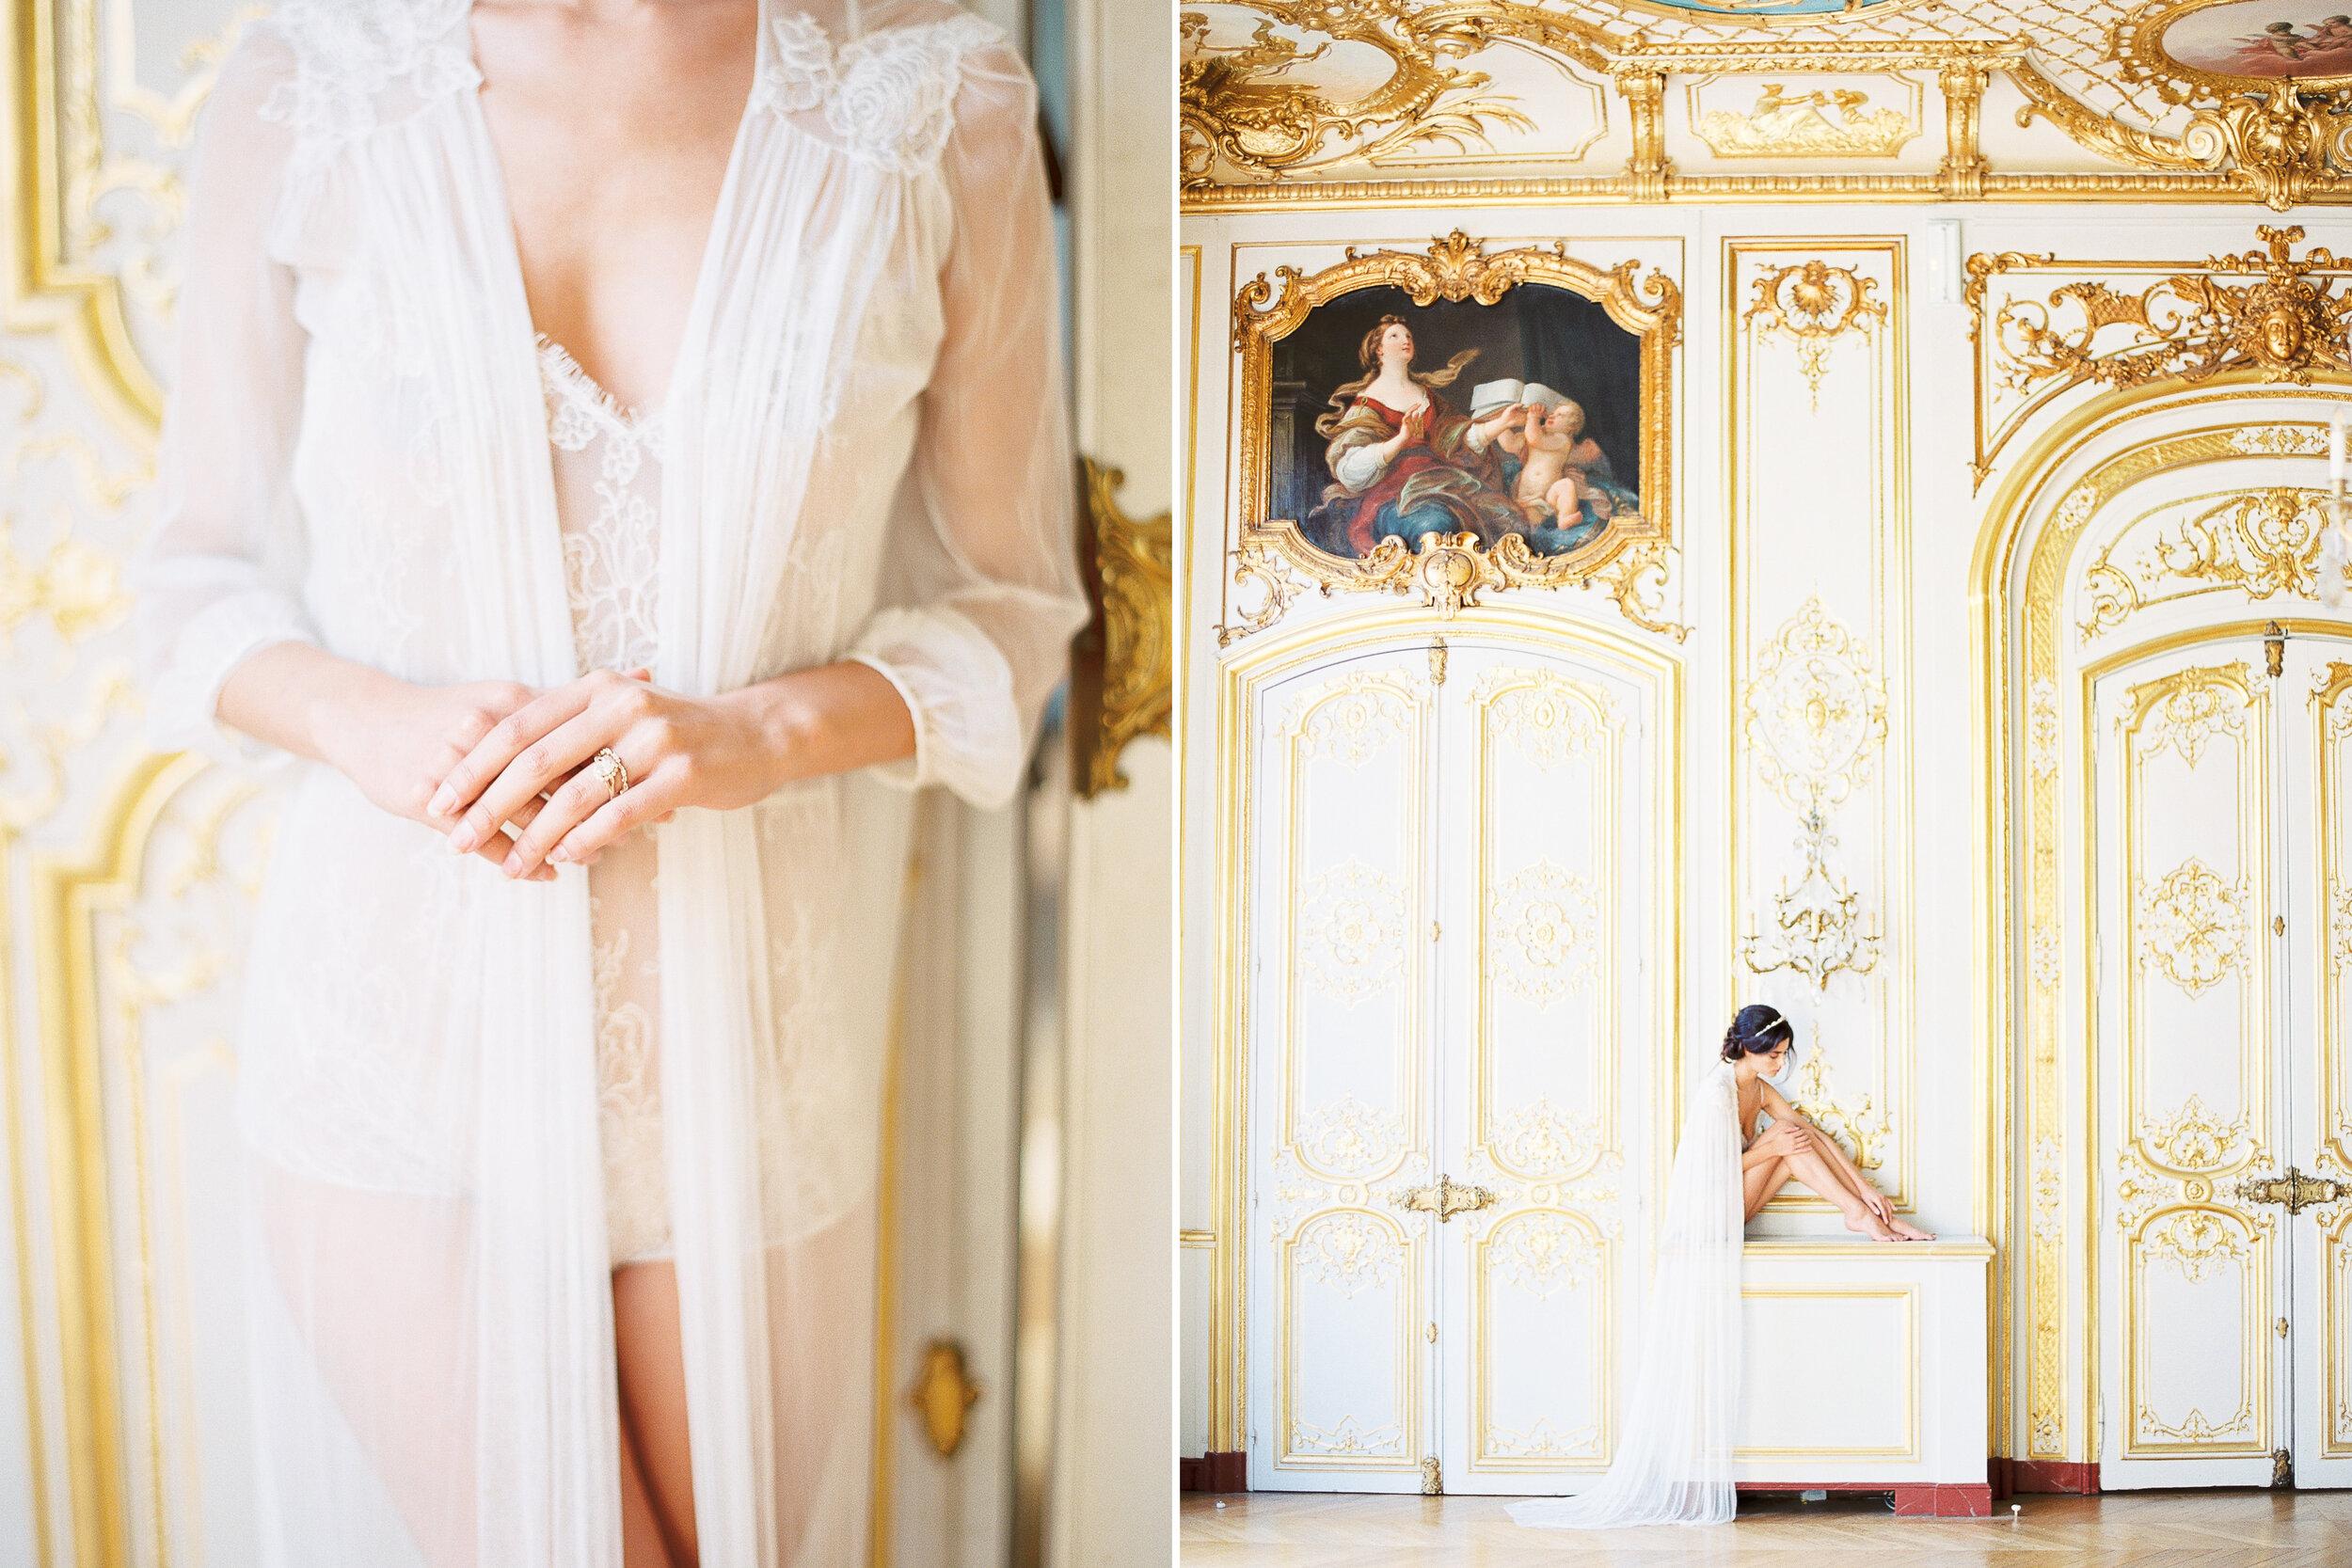 RachelOwensPhotography - ParisWeddingInspiration - 4.jpg